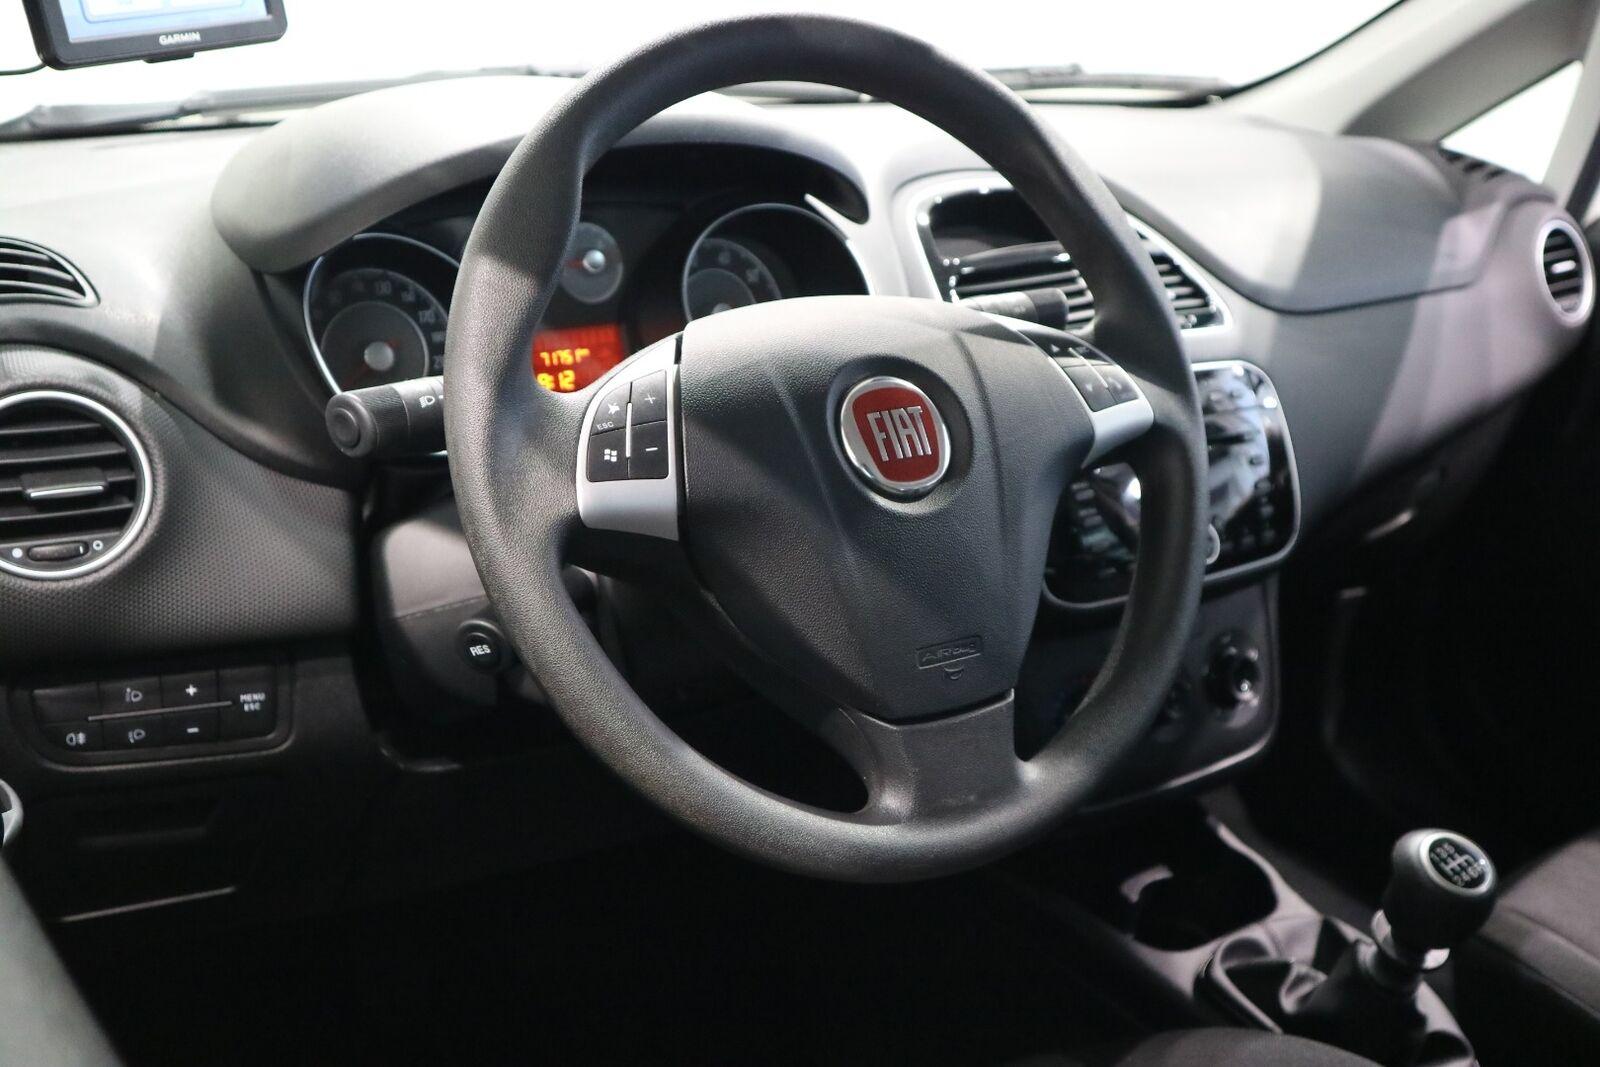 Fiat Punto 0,9 TwinAir 85 - billede 7